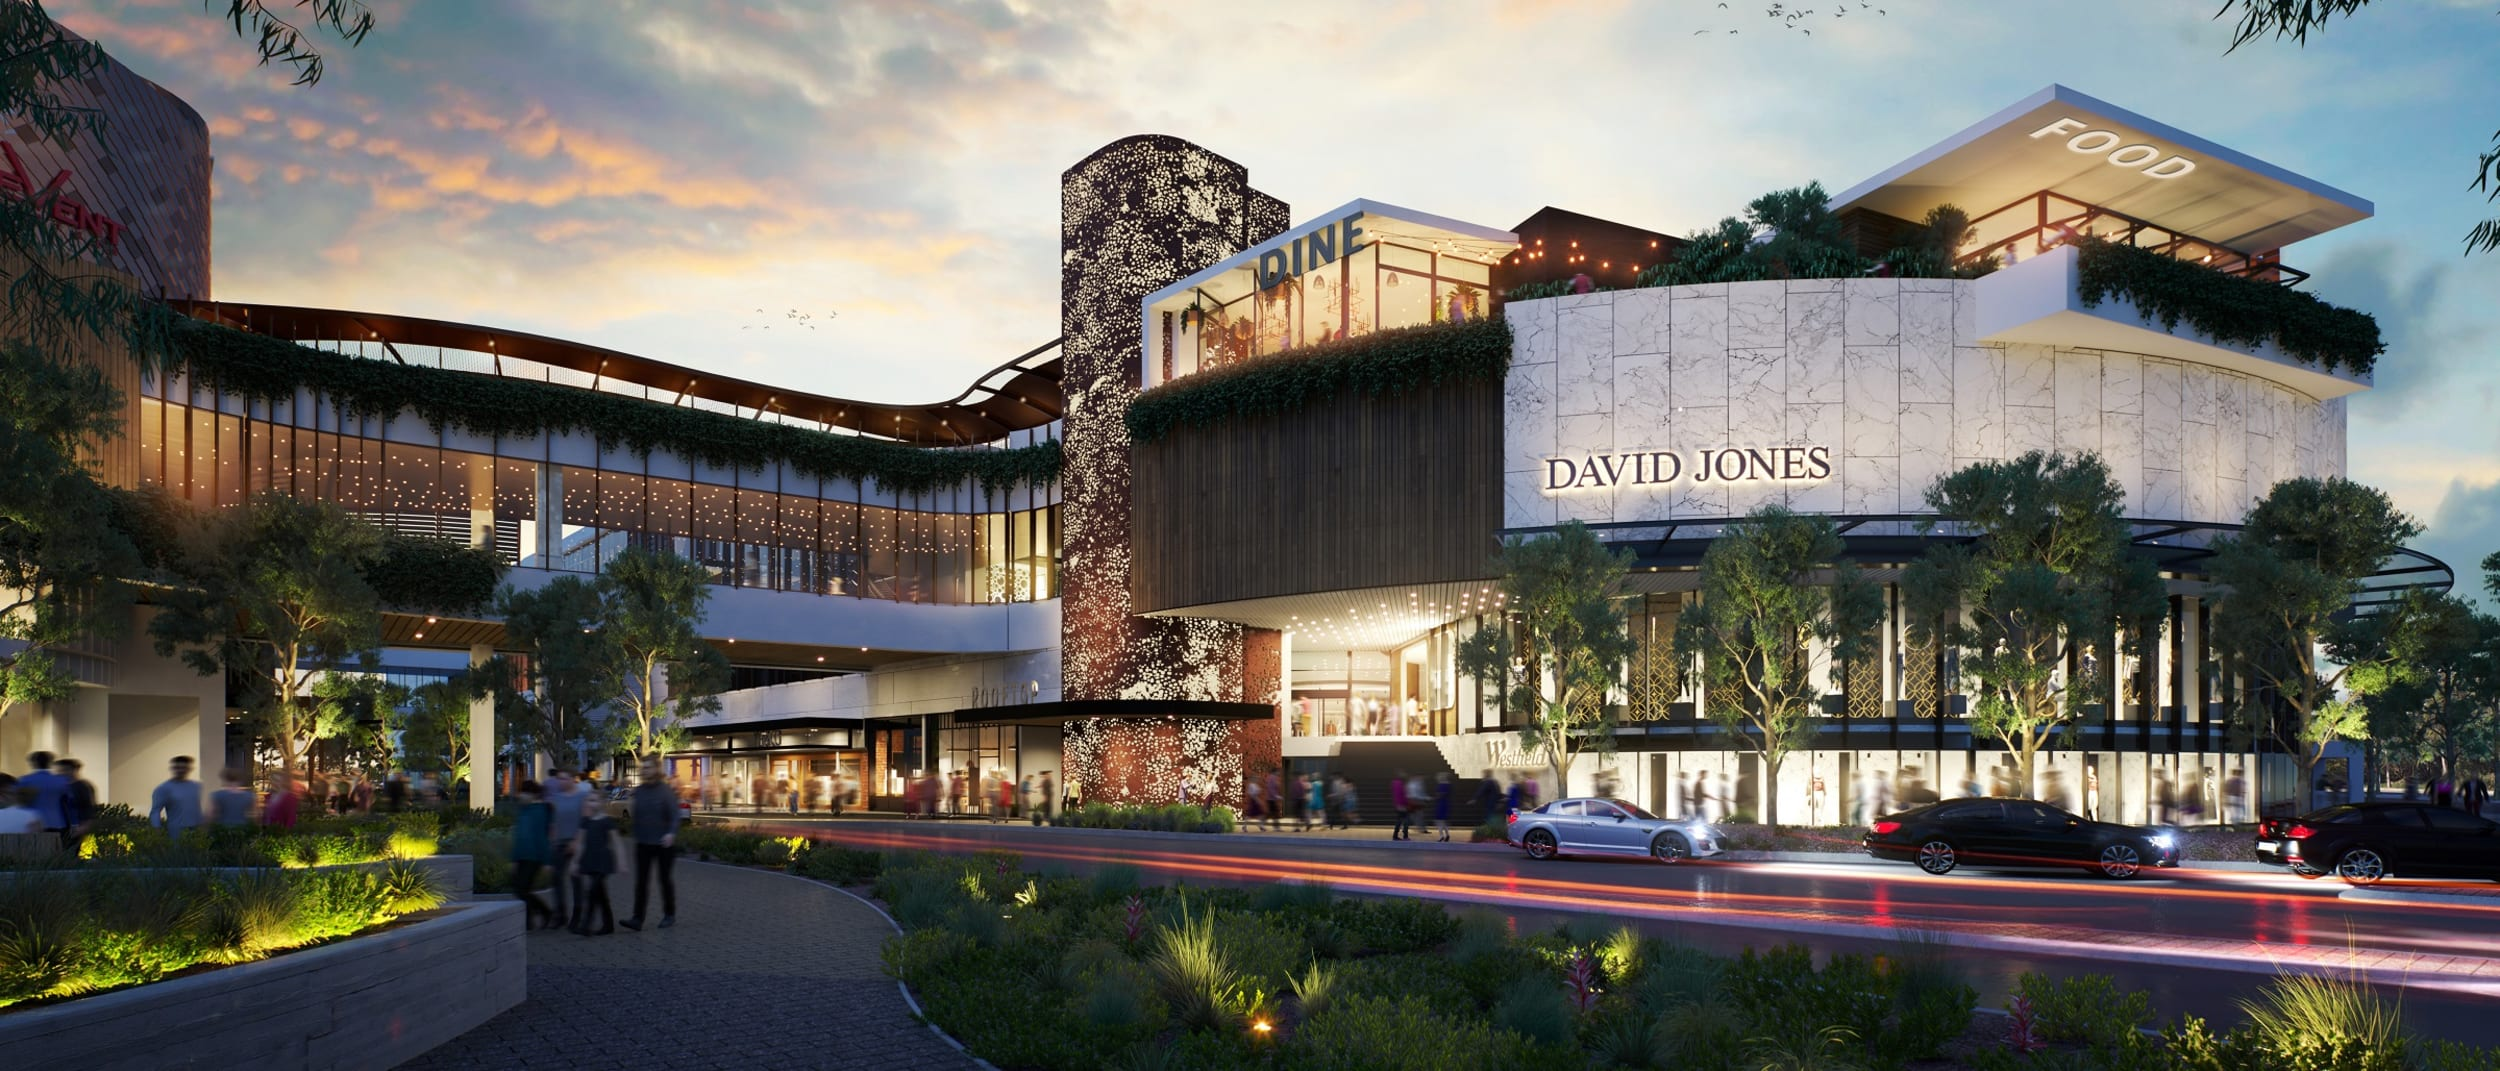 Discover the vision for Perth's premiere lifestyle destination